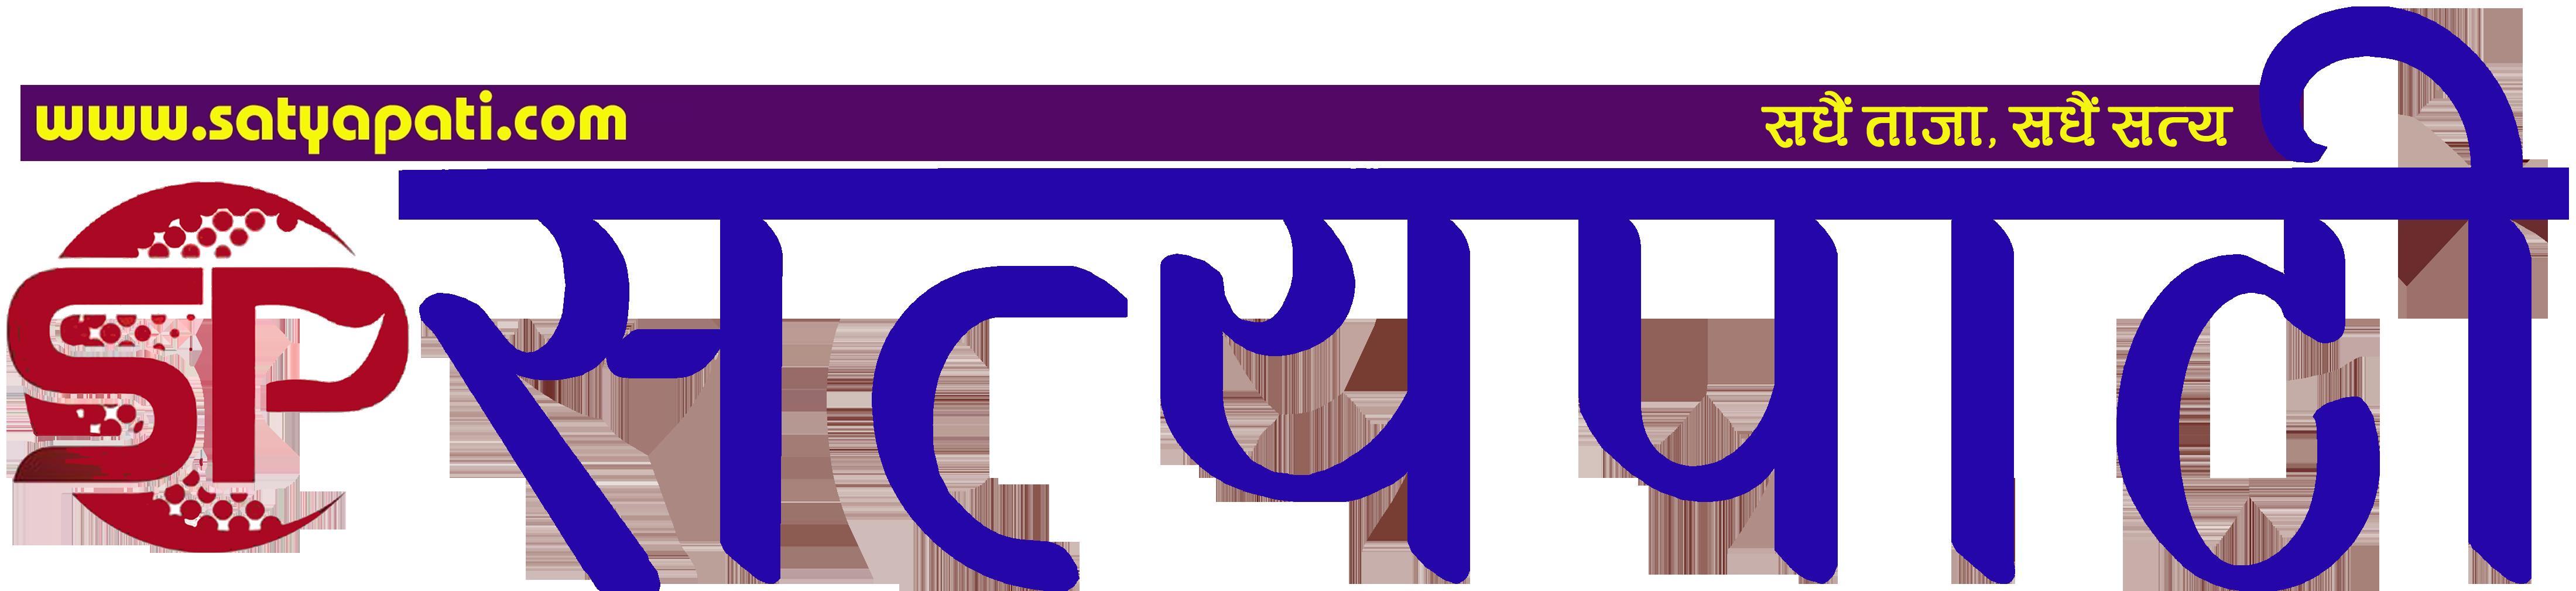 Satyapati.com